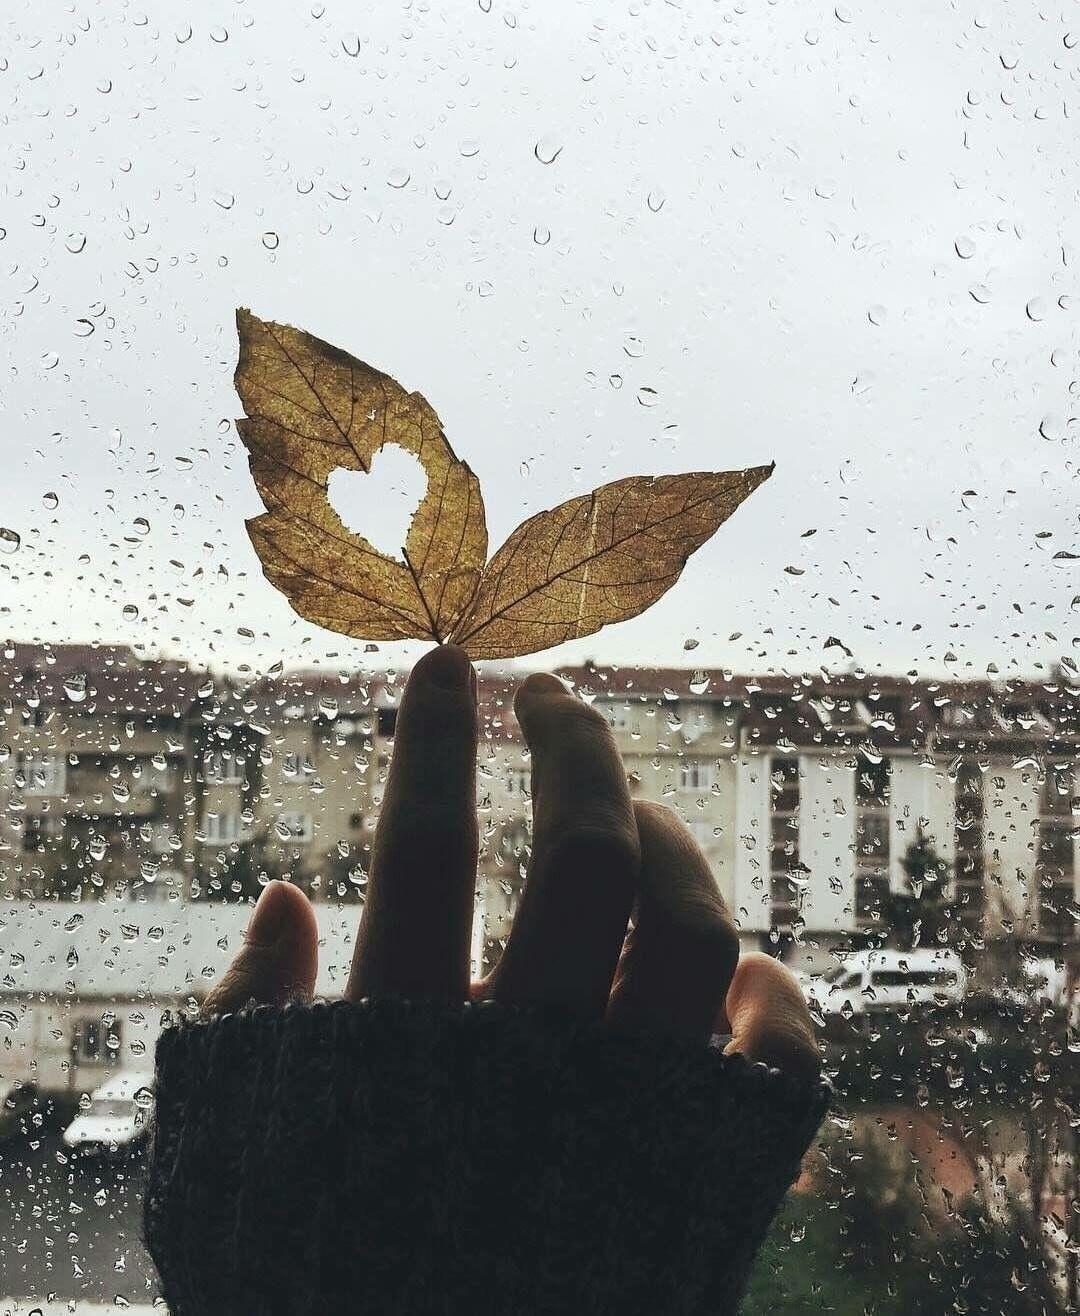 Winter Fotografi Seni Hari Hujan Fotografi Abstrak